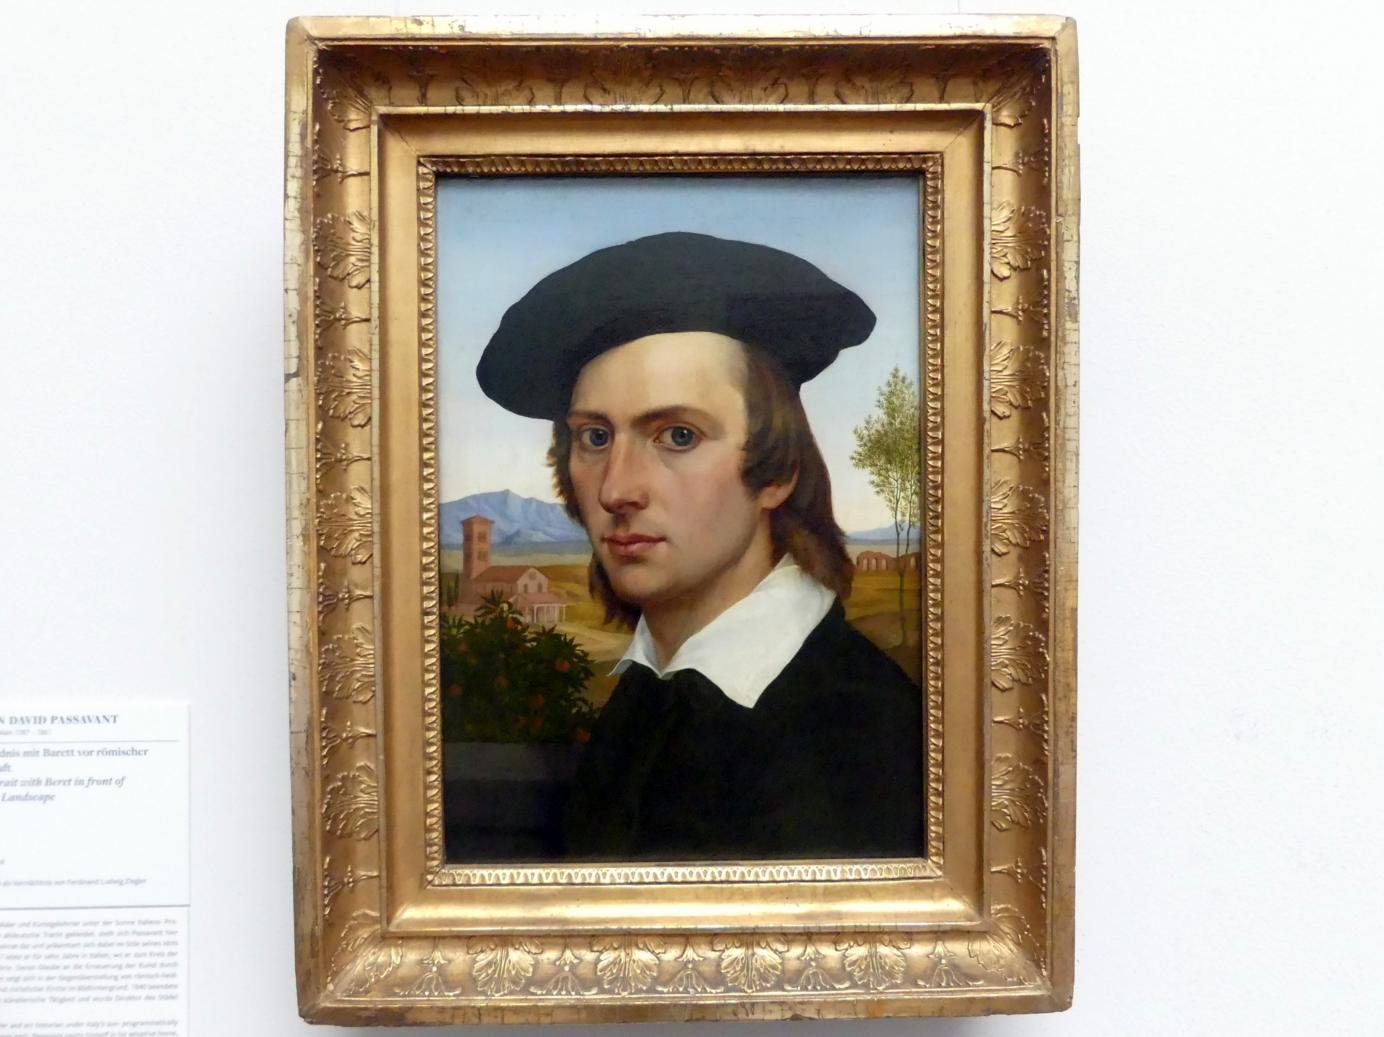 Johann David Passavant (1787 Frankfurt am Main - 1861 Frankfurt am Main)